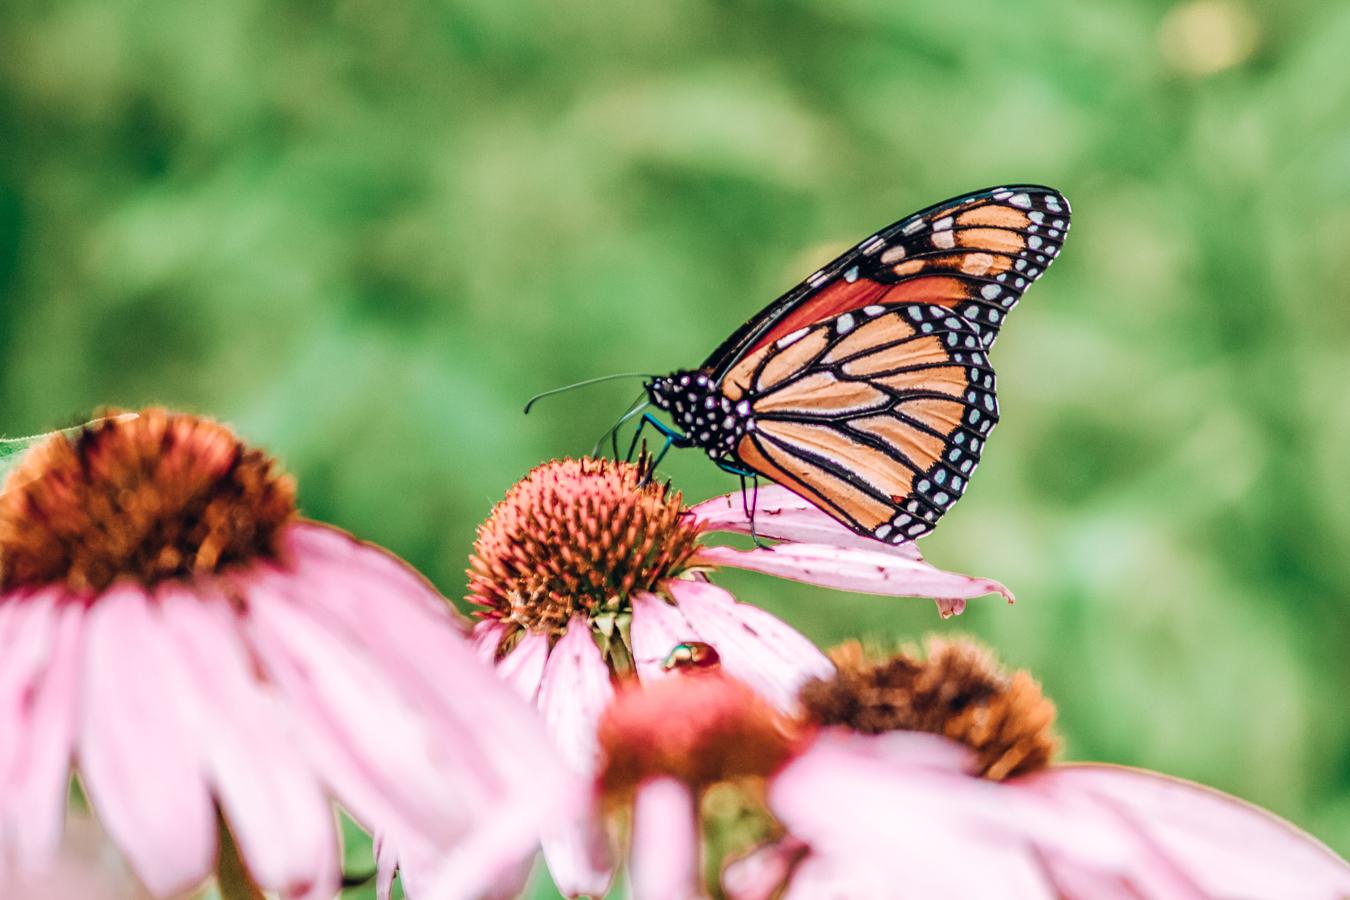 Butterfly at the Lauritzen Gardens